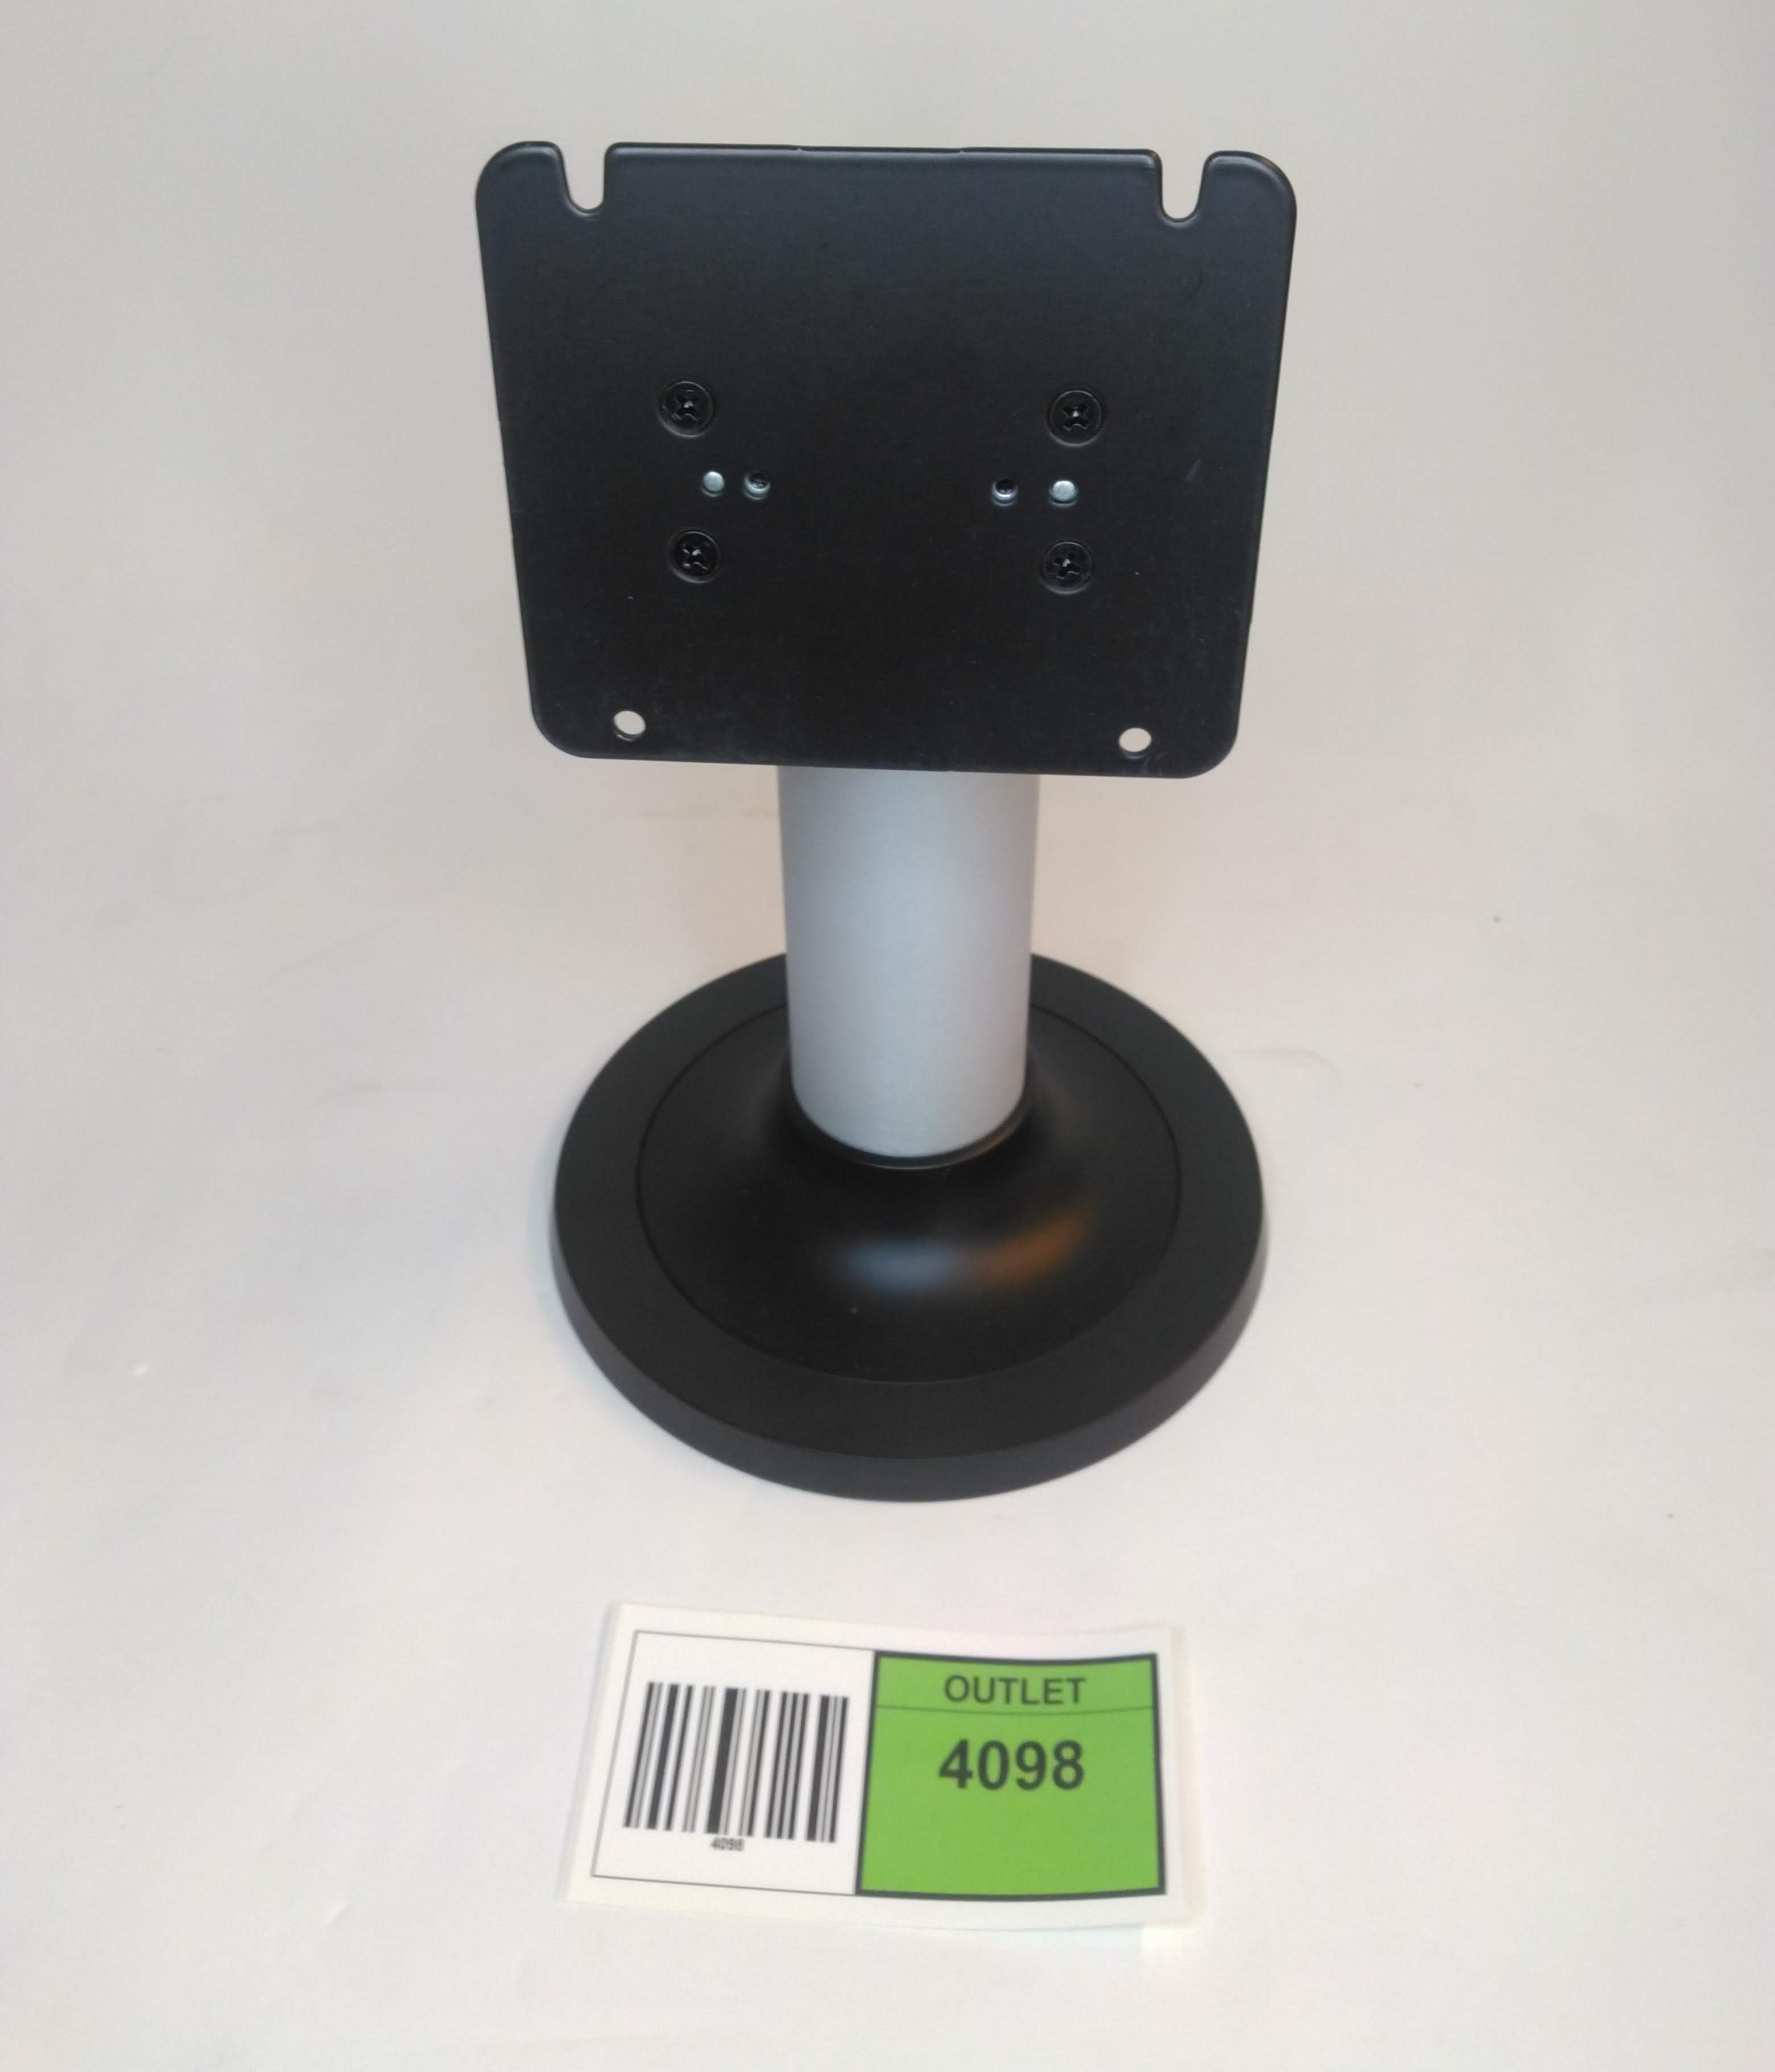 Elo TouchSystems Monitor Accessories E047458 Image 1